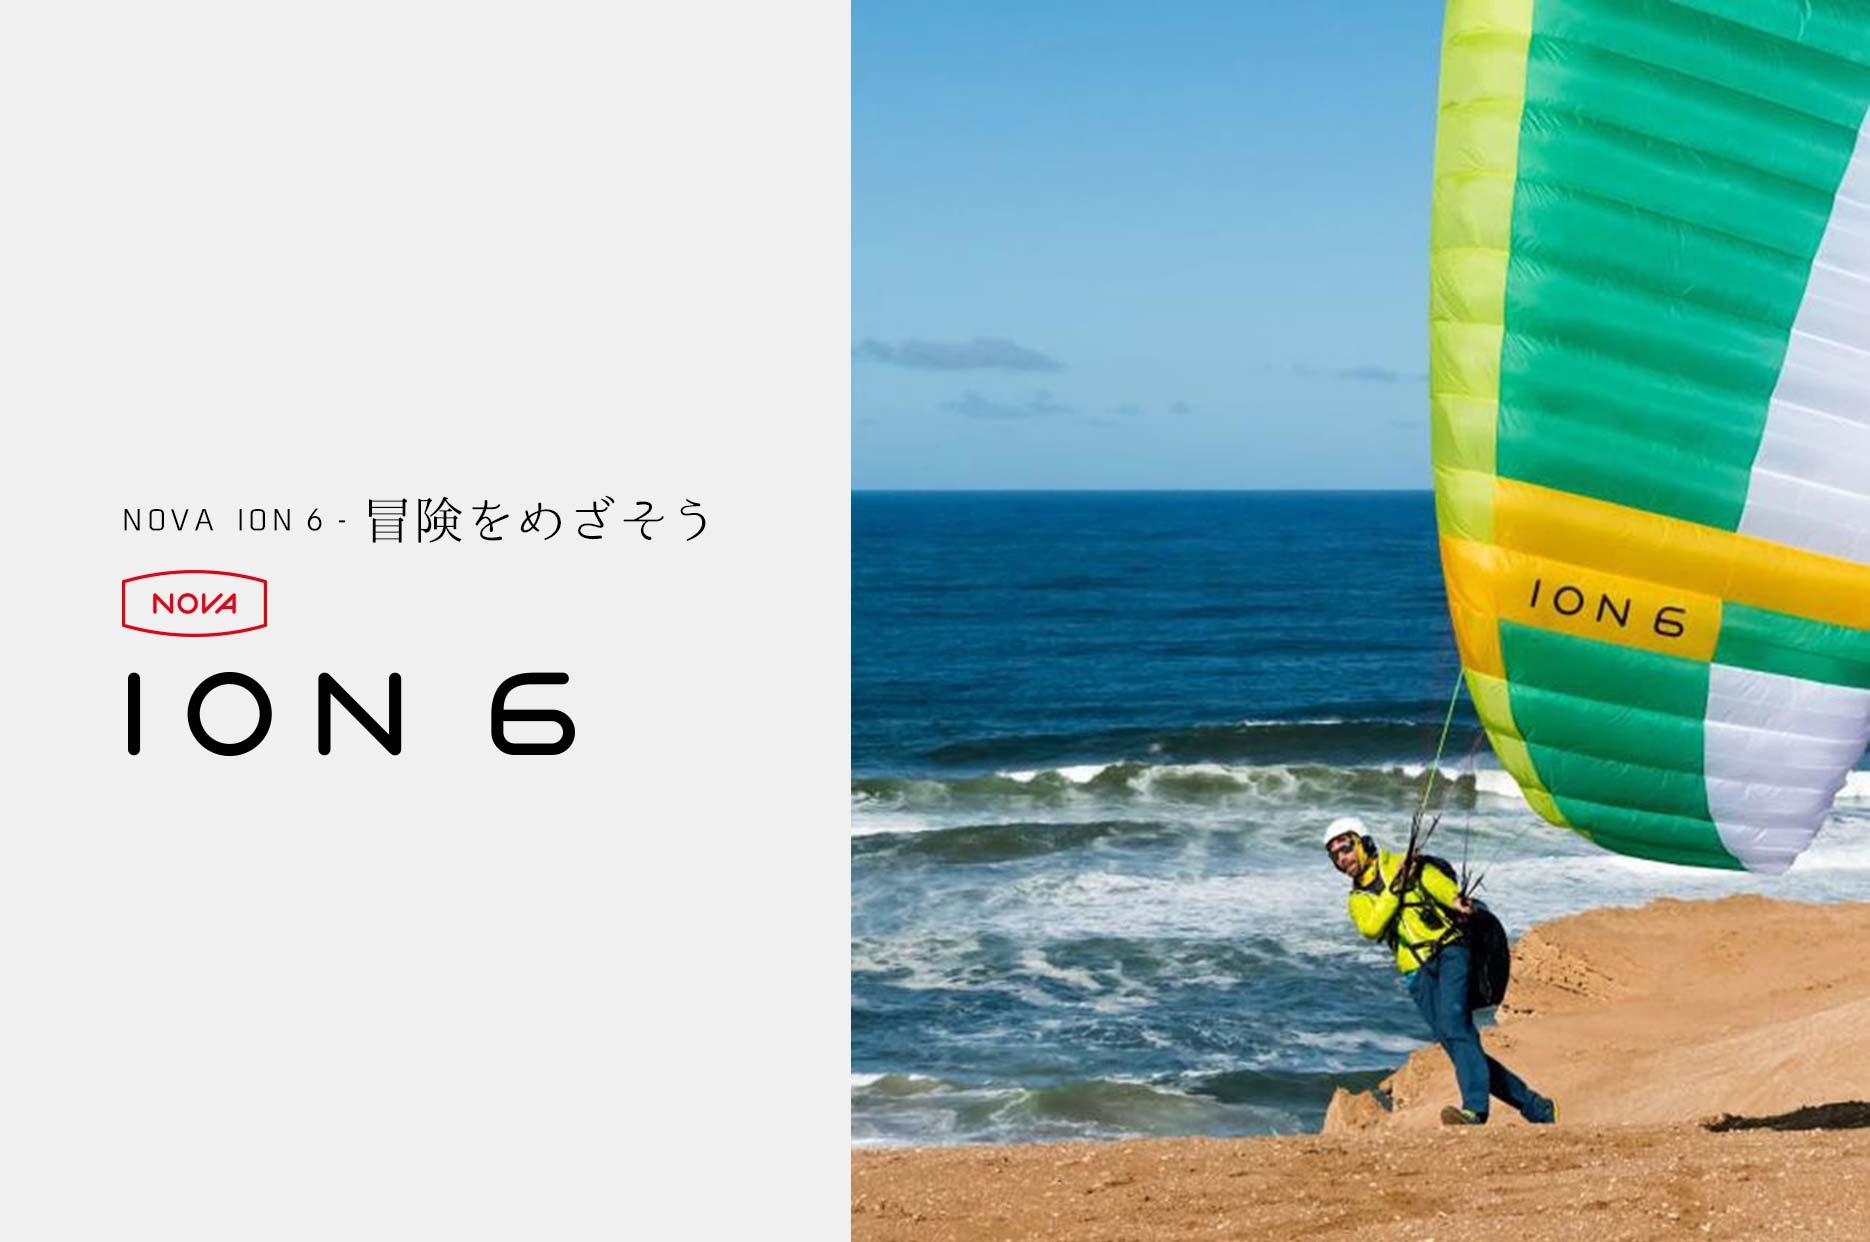 NOVA ION 6 発表